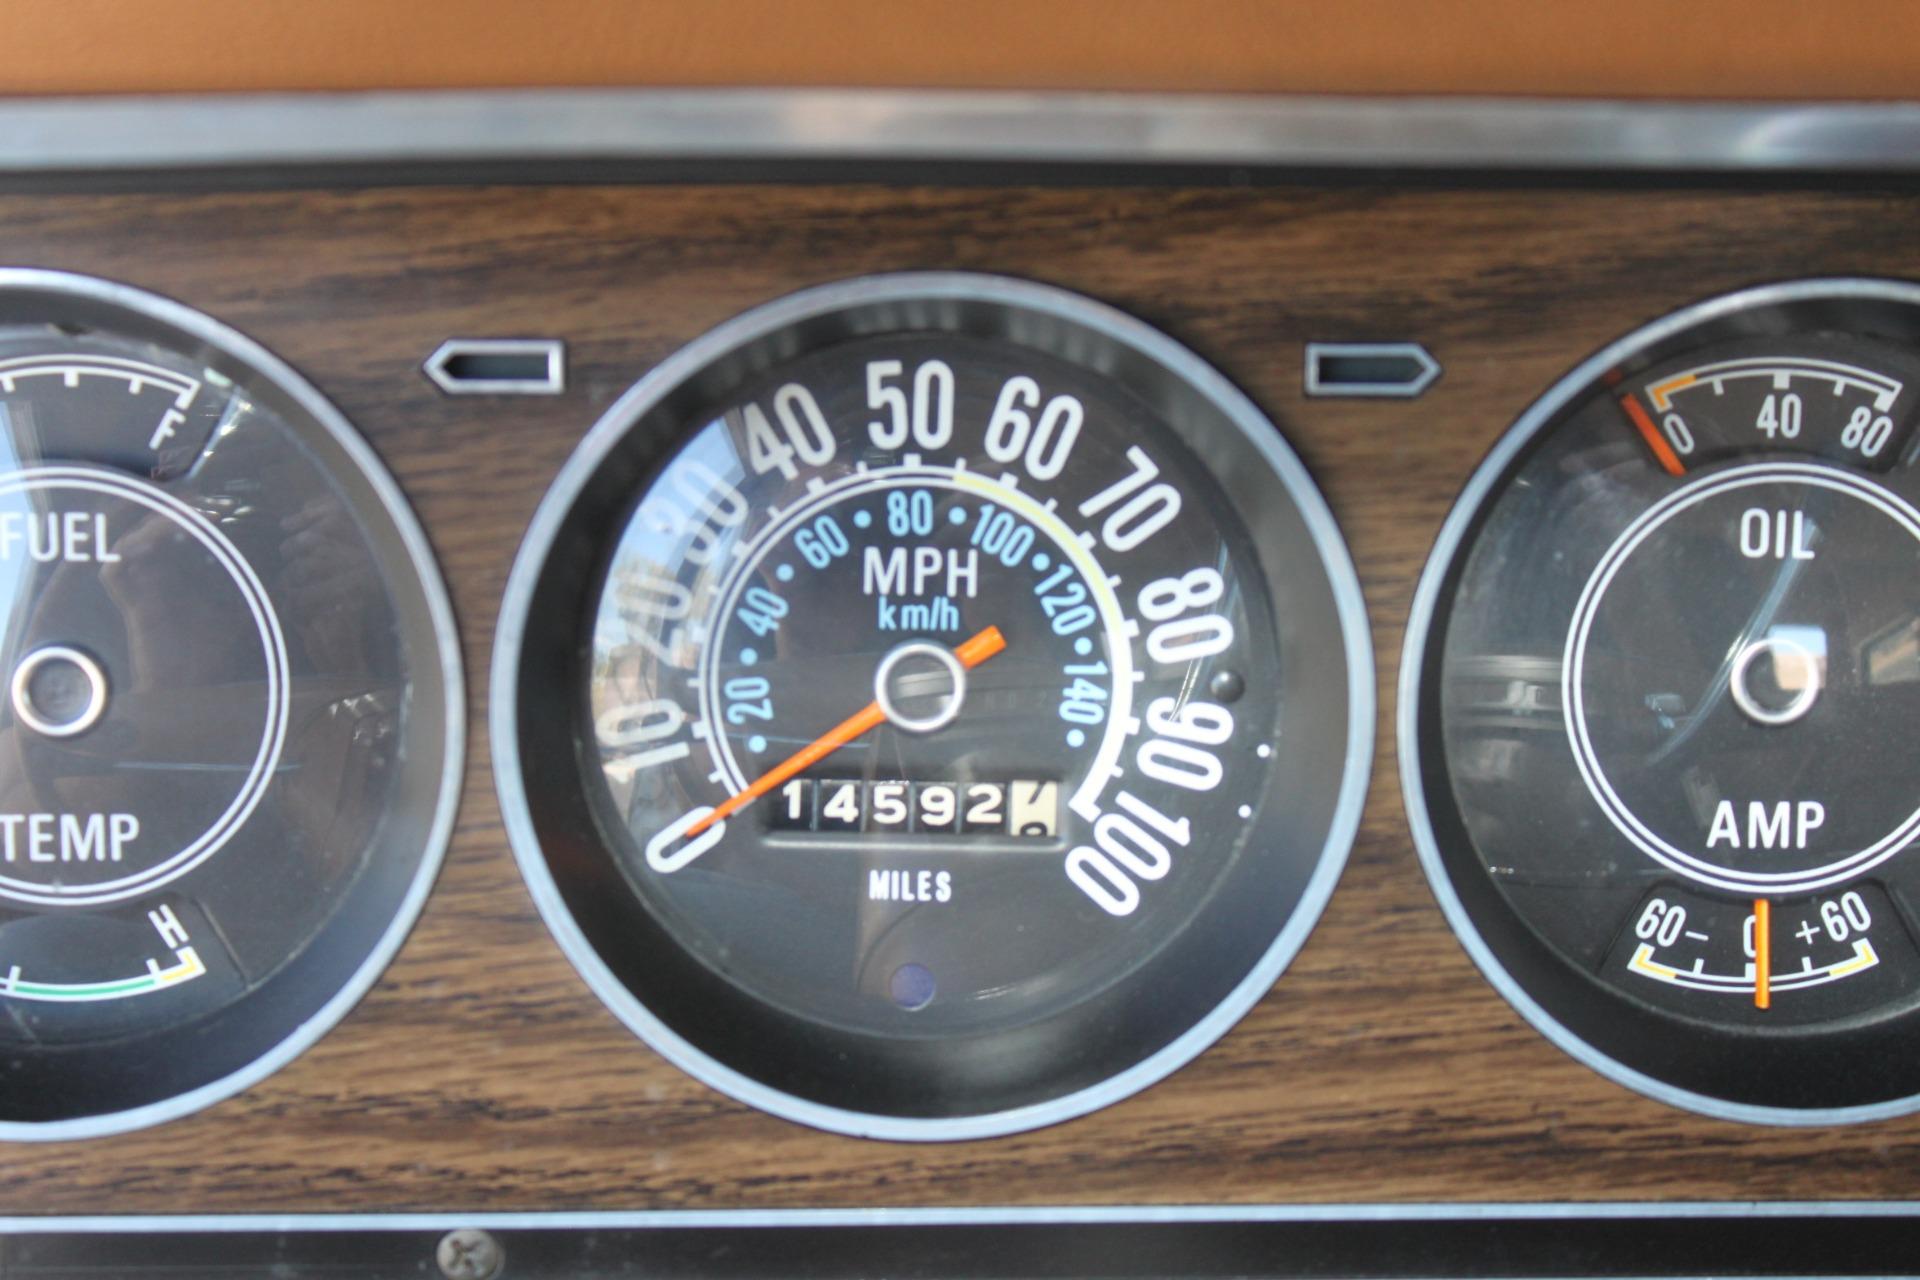 Used-1977-Jeep-Wagoneer-Custom-Fuel-Injected-66-Liter-401-Jeep